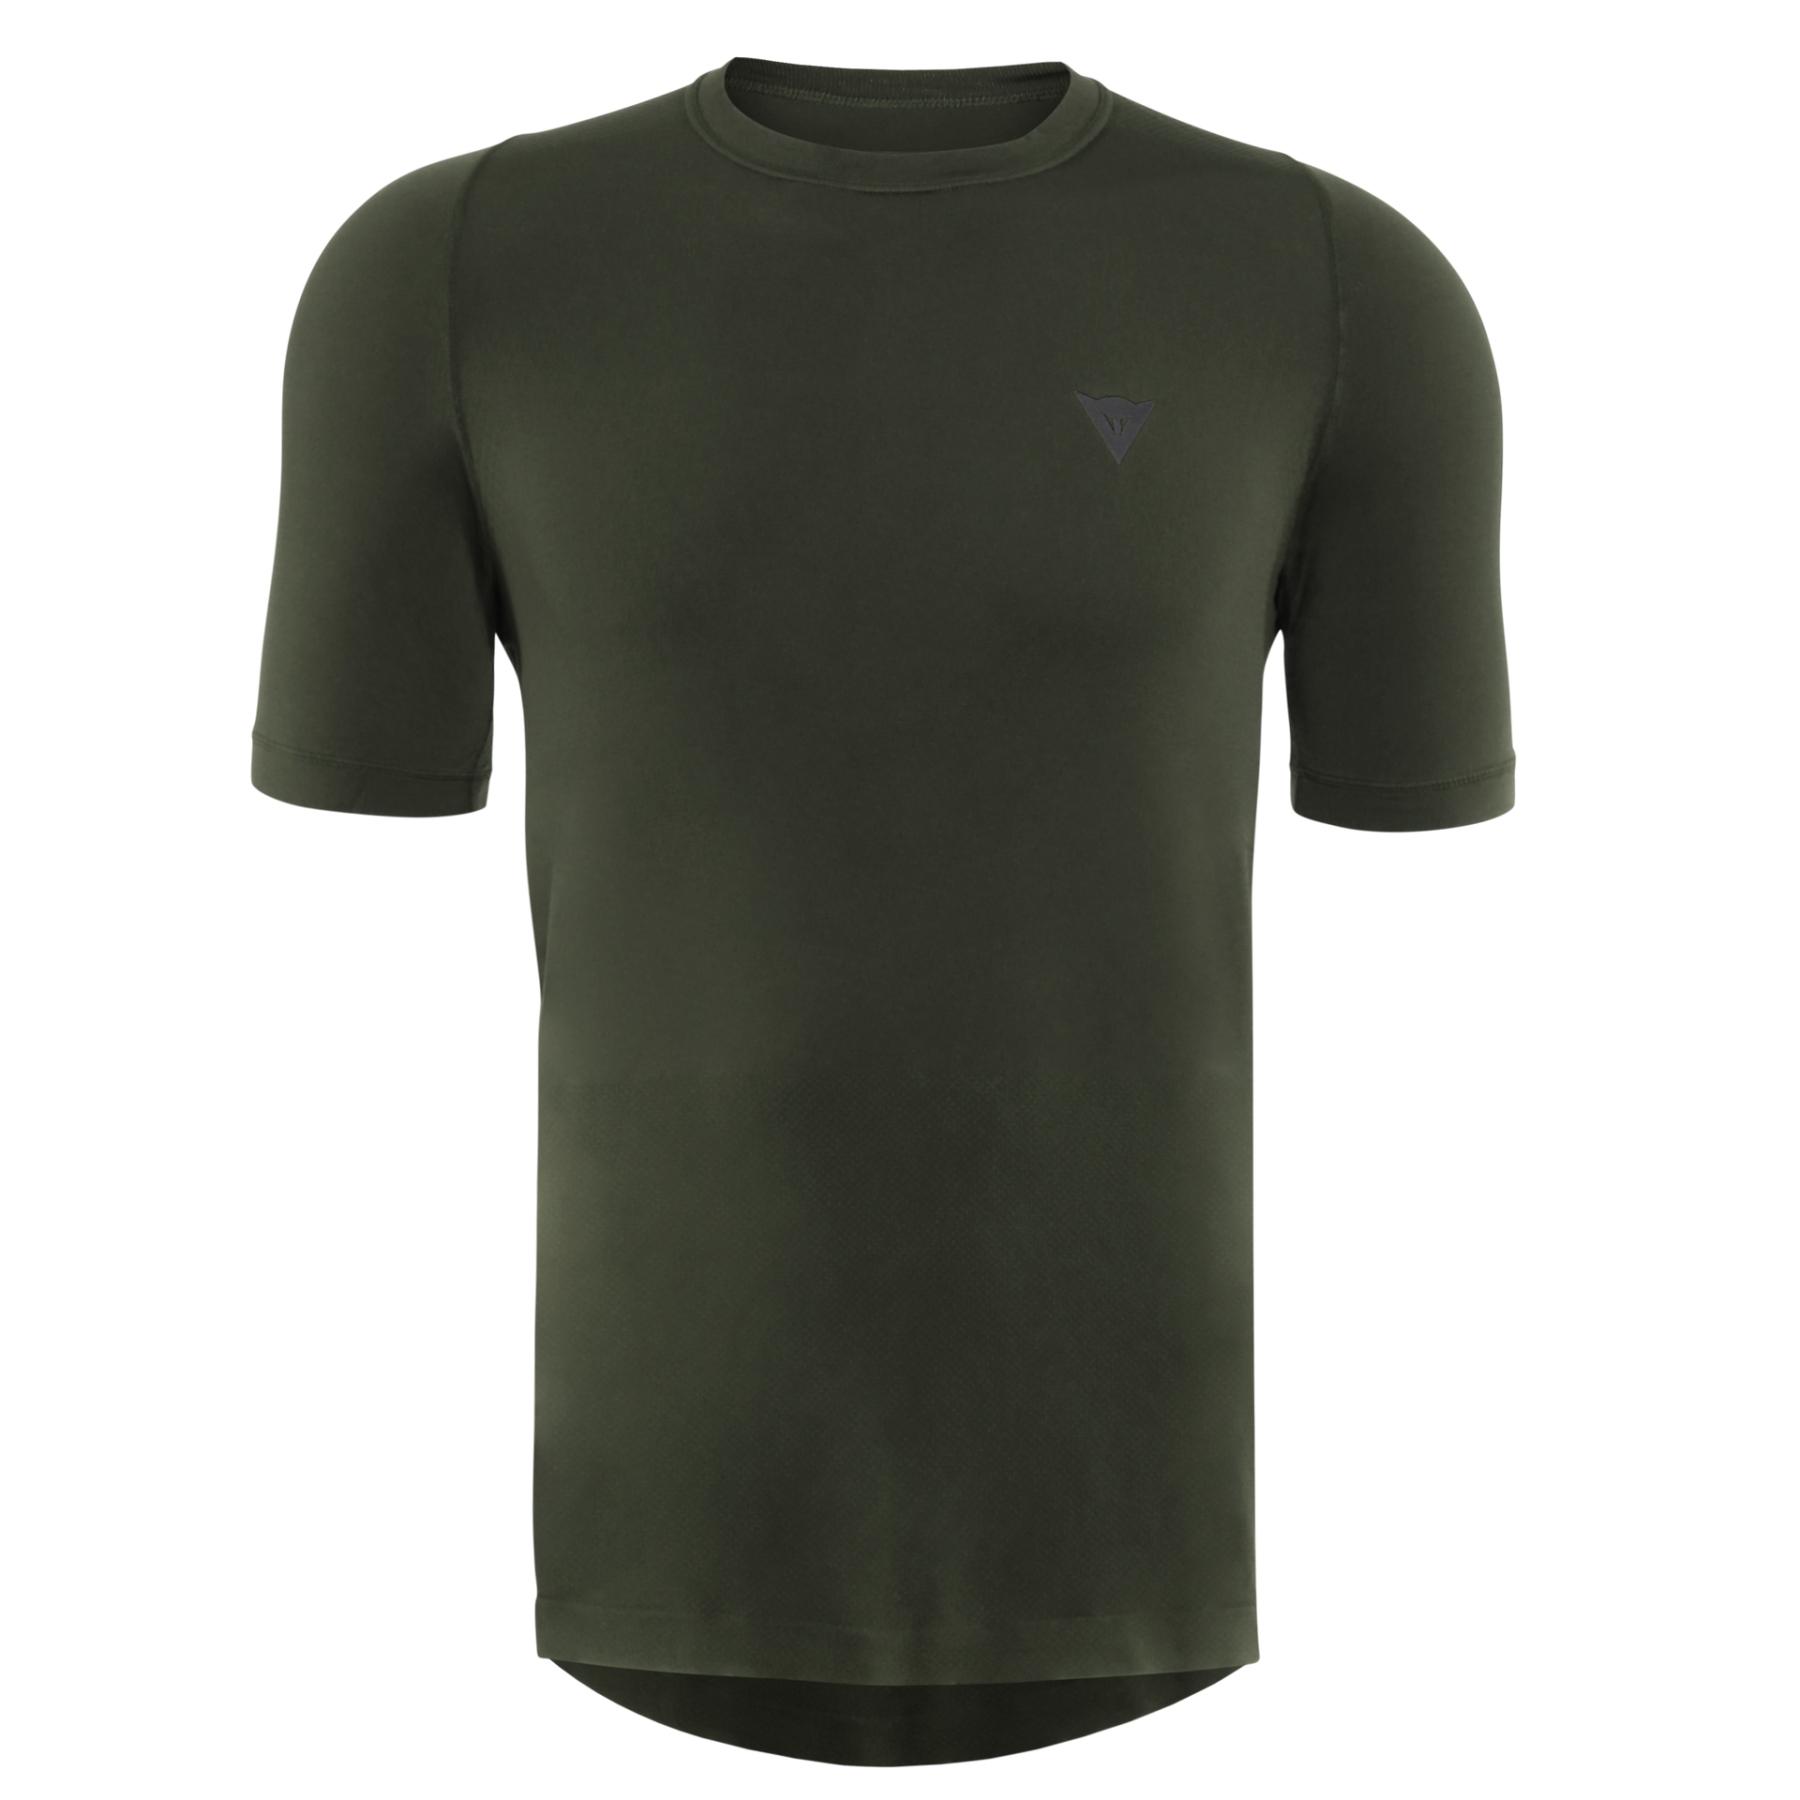 Picture of Dainese HGL Baciu MTB Shortsleeve Jersey - dark-green